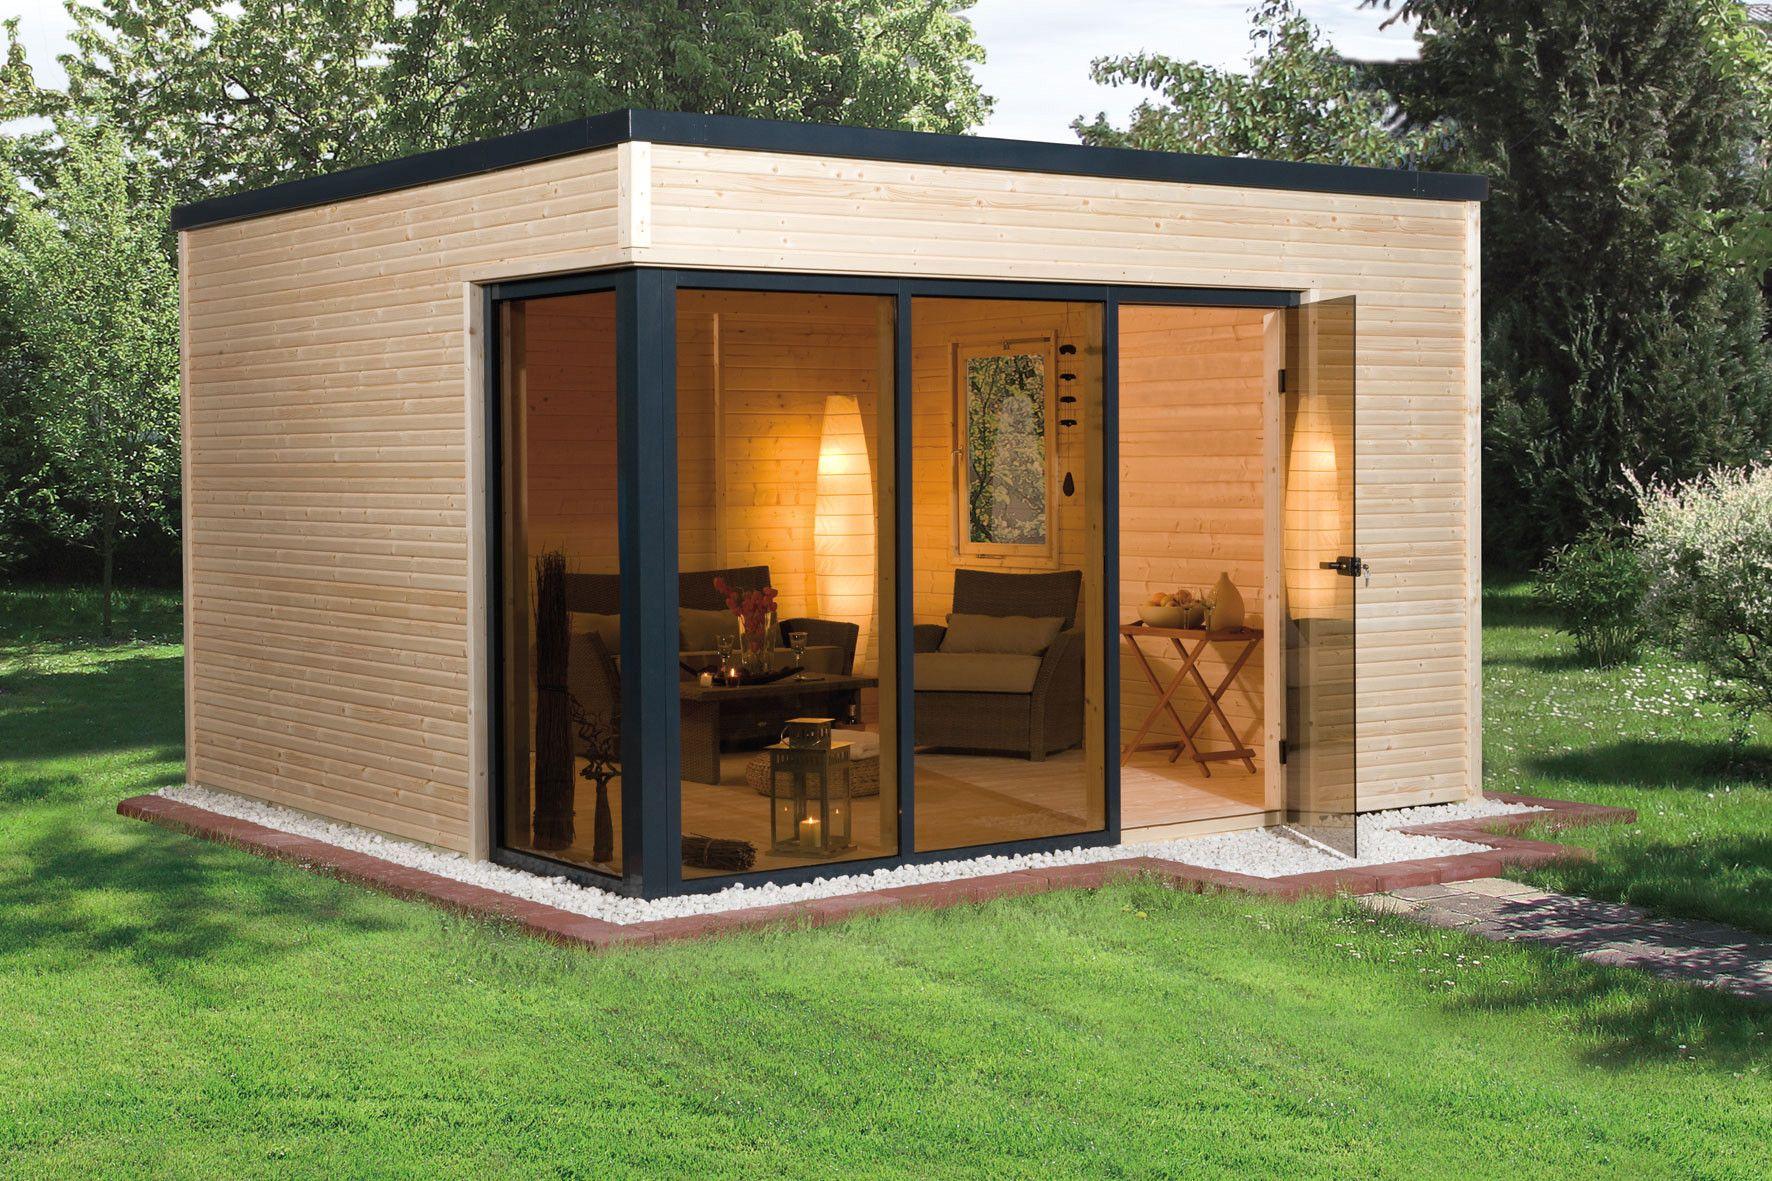 Fußboden Gartenhaus Ytong ~ Weka gartenhaus lounge modernes gartenhaus mit flachdach und